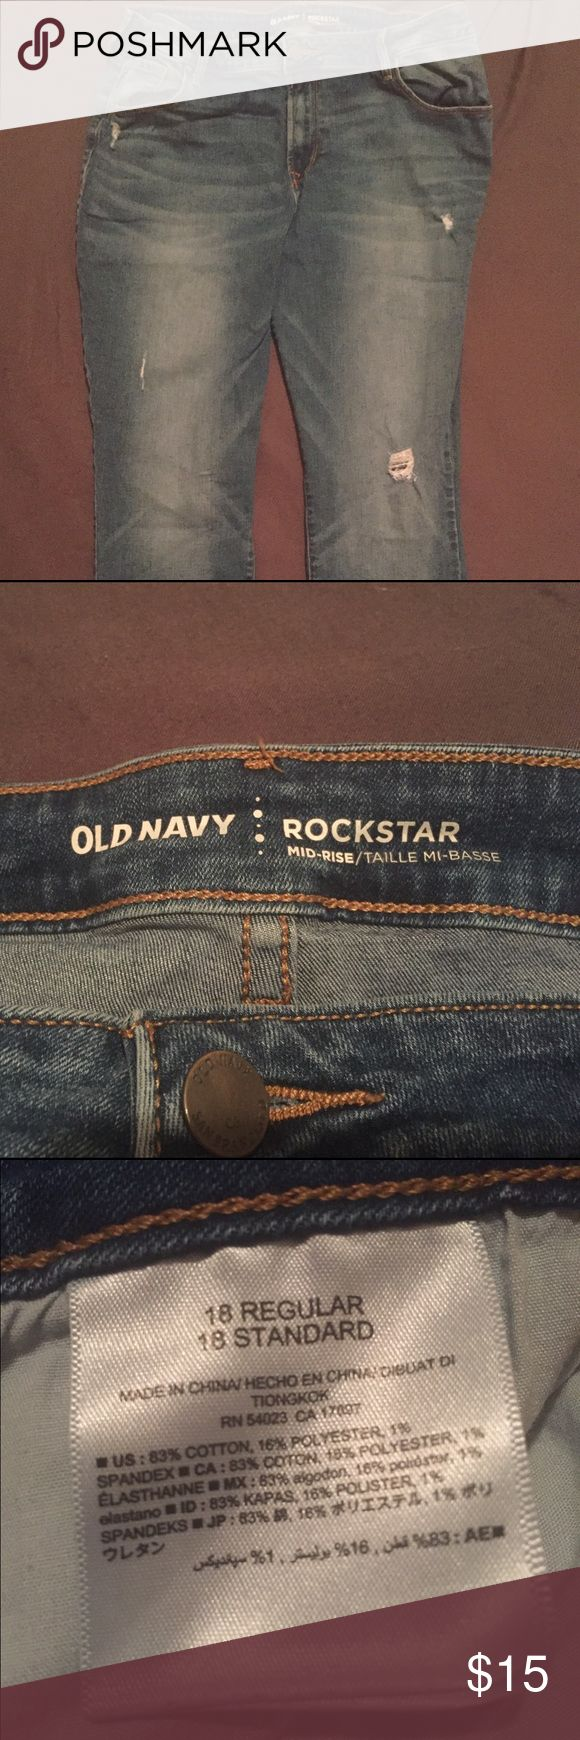 Old Navy Midrise Rockstar Jean Size 18 regular midrise rockstar jeans, gently worn. Sized out after WLS. Old Navy Jeans Straight Leg